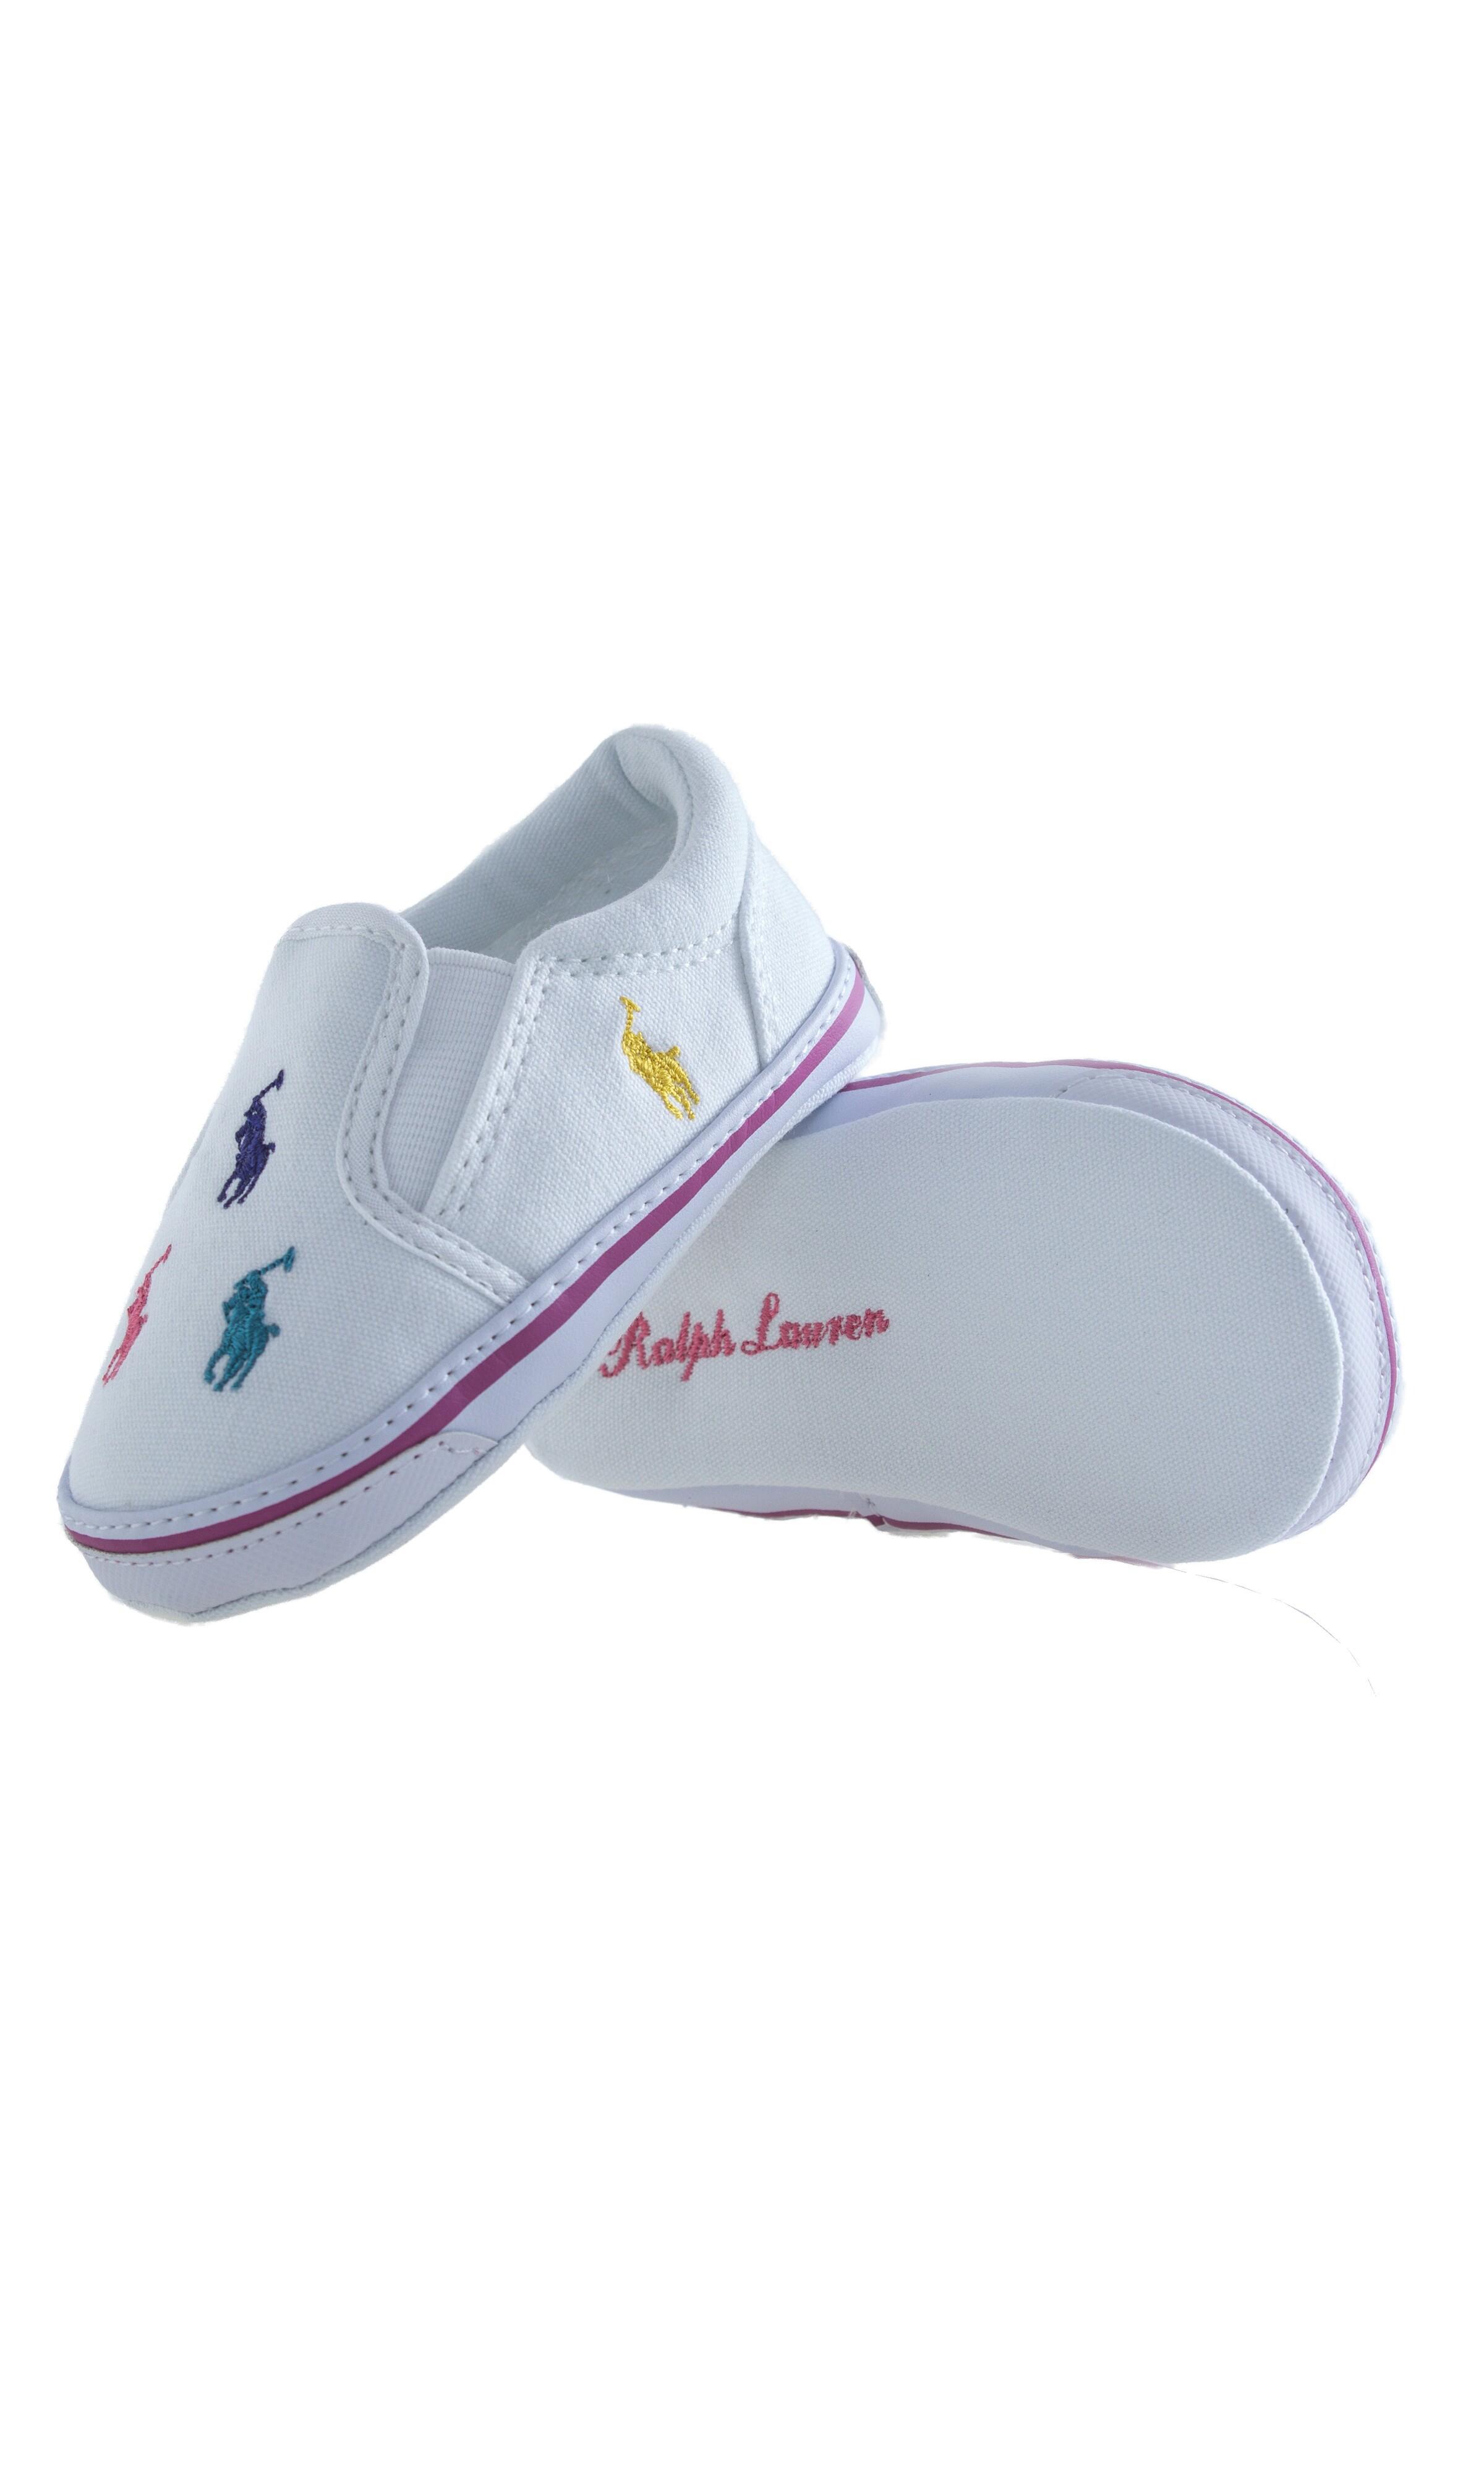 White baby shoes Ralph Lauren Celebrity Club